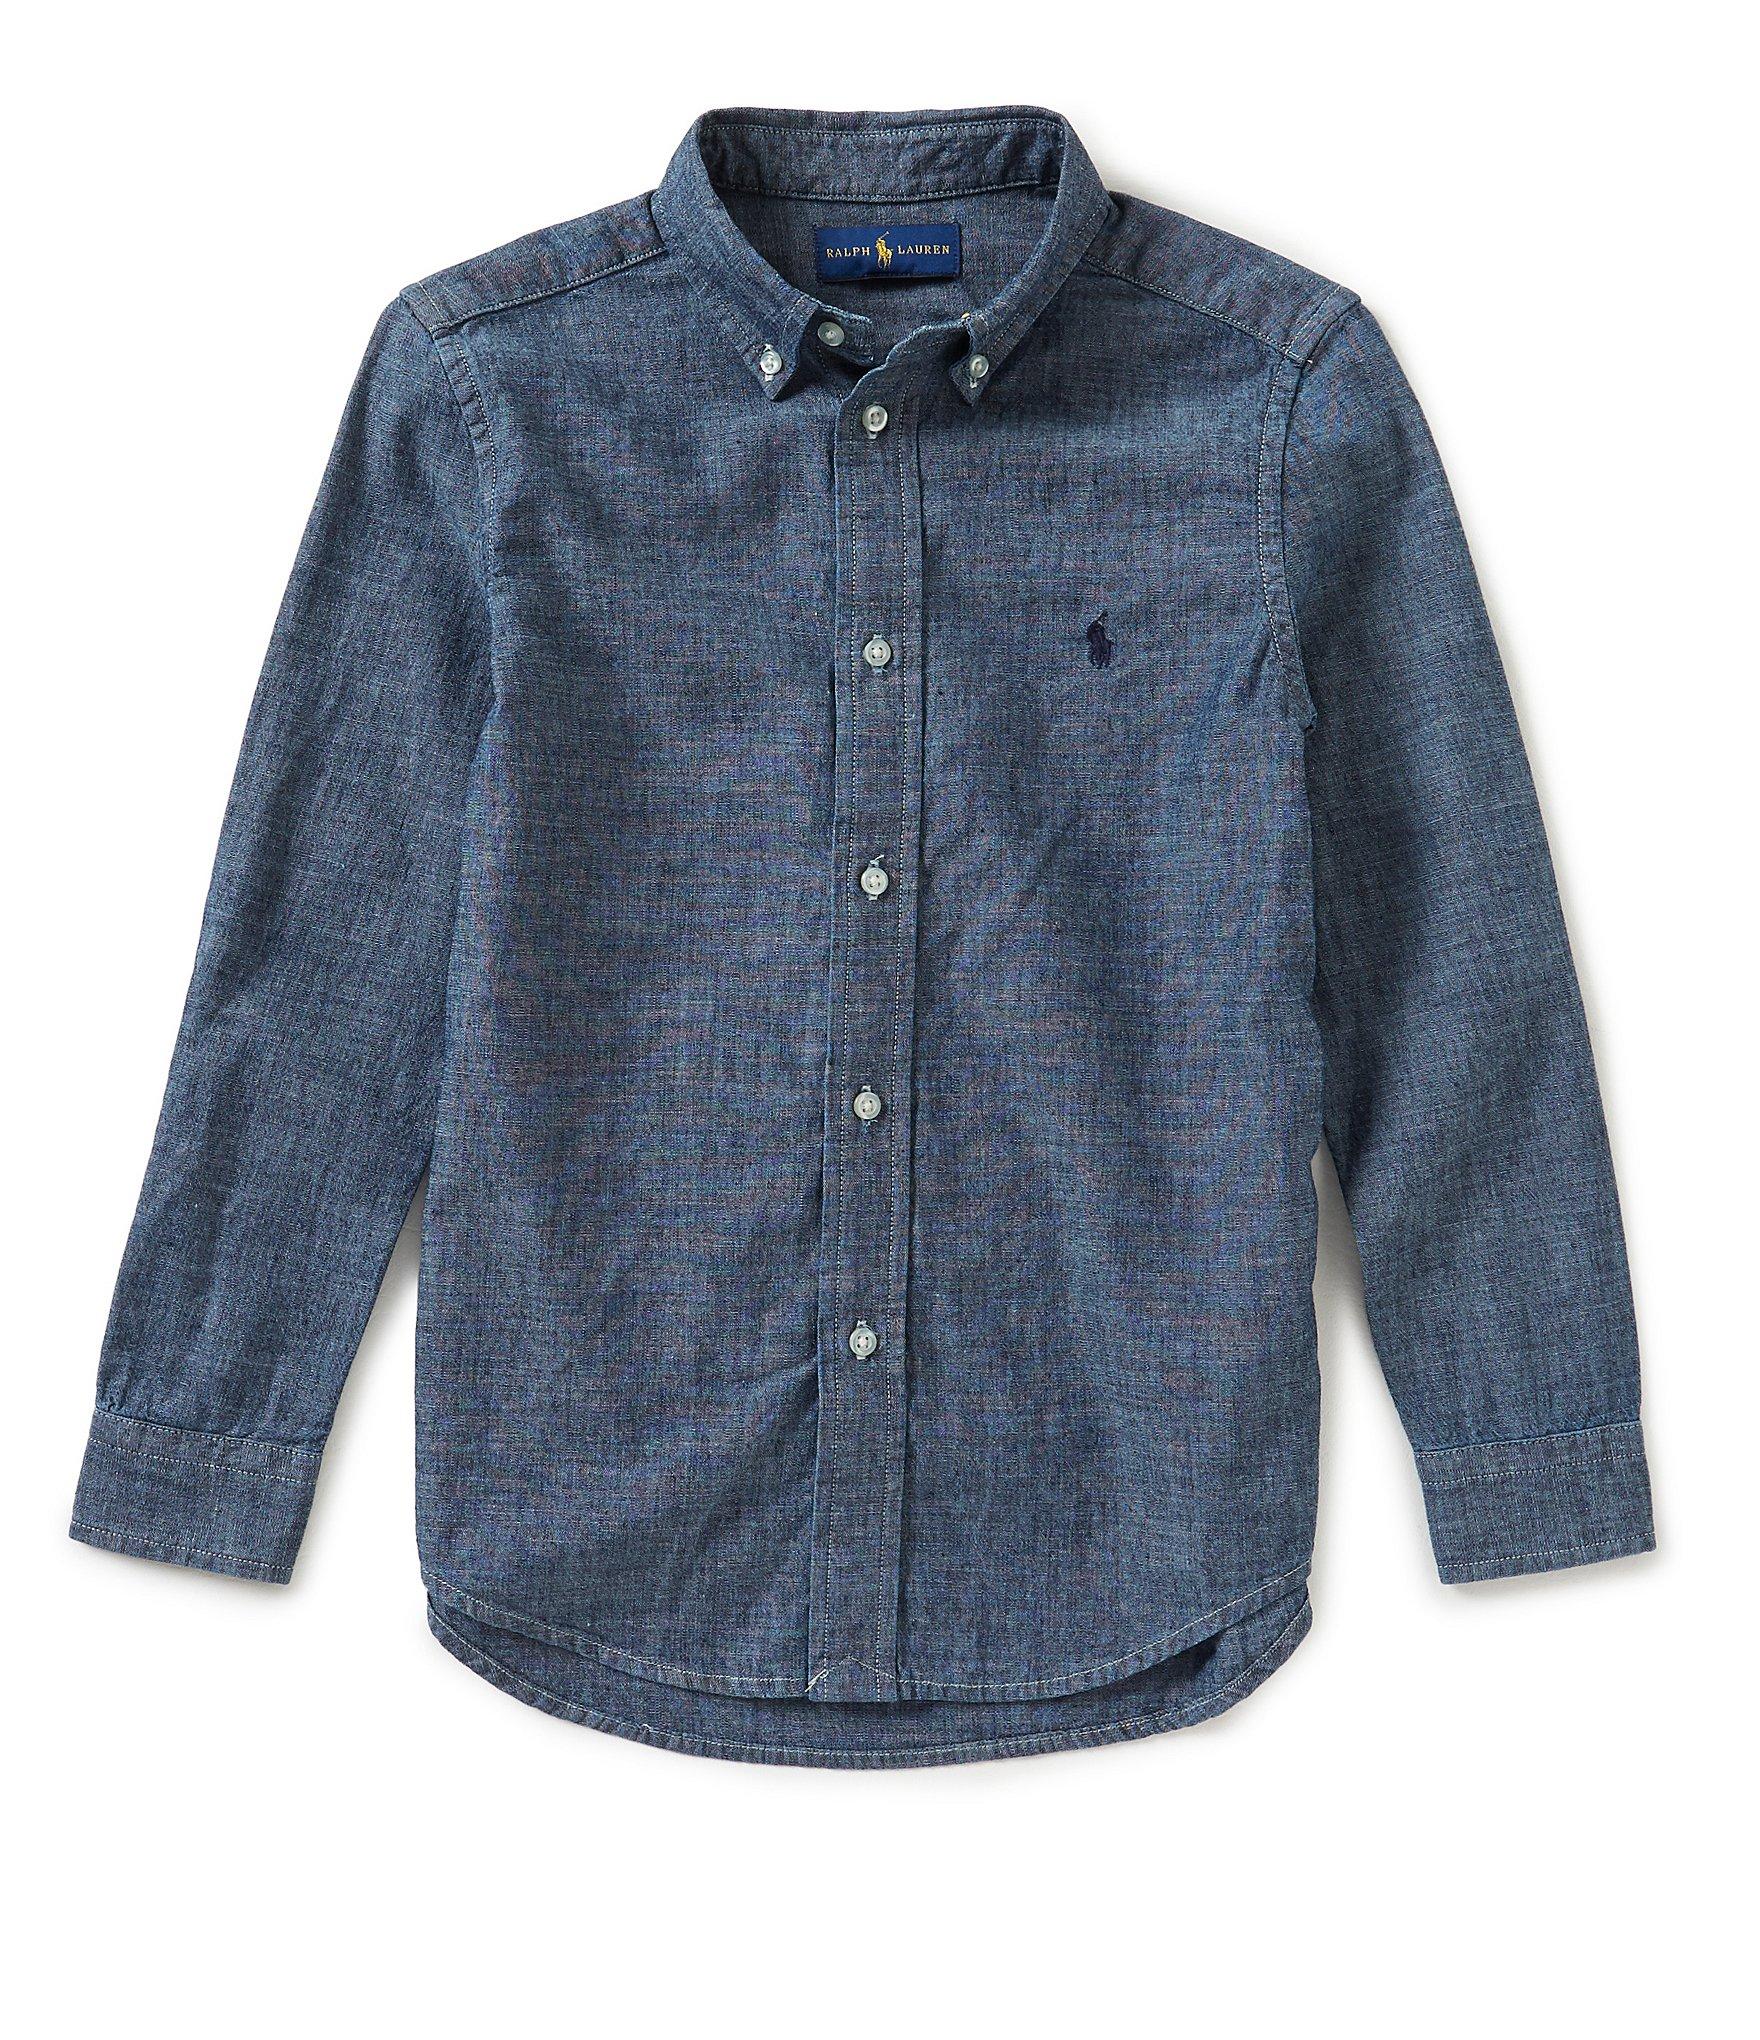 Ralph lauren childrenswear little boys 2t 7 button down for Chambray shirt for kids